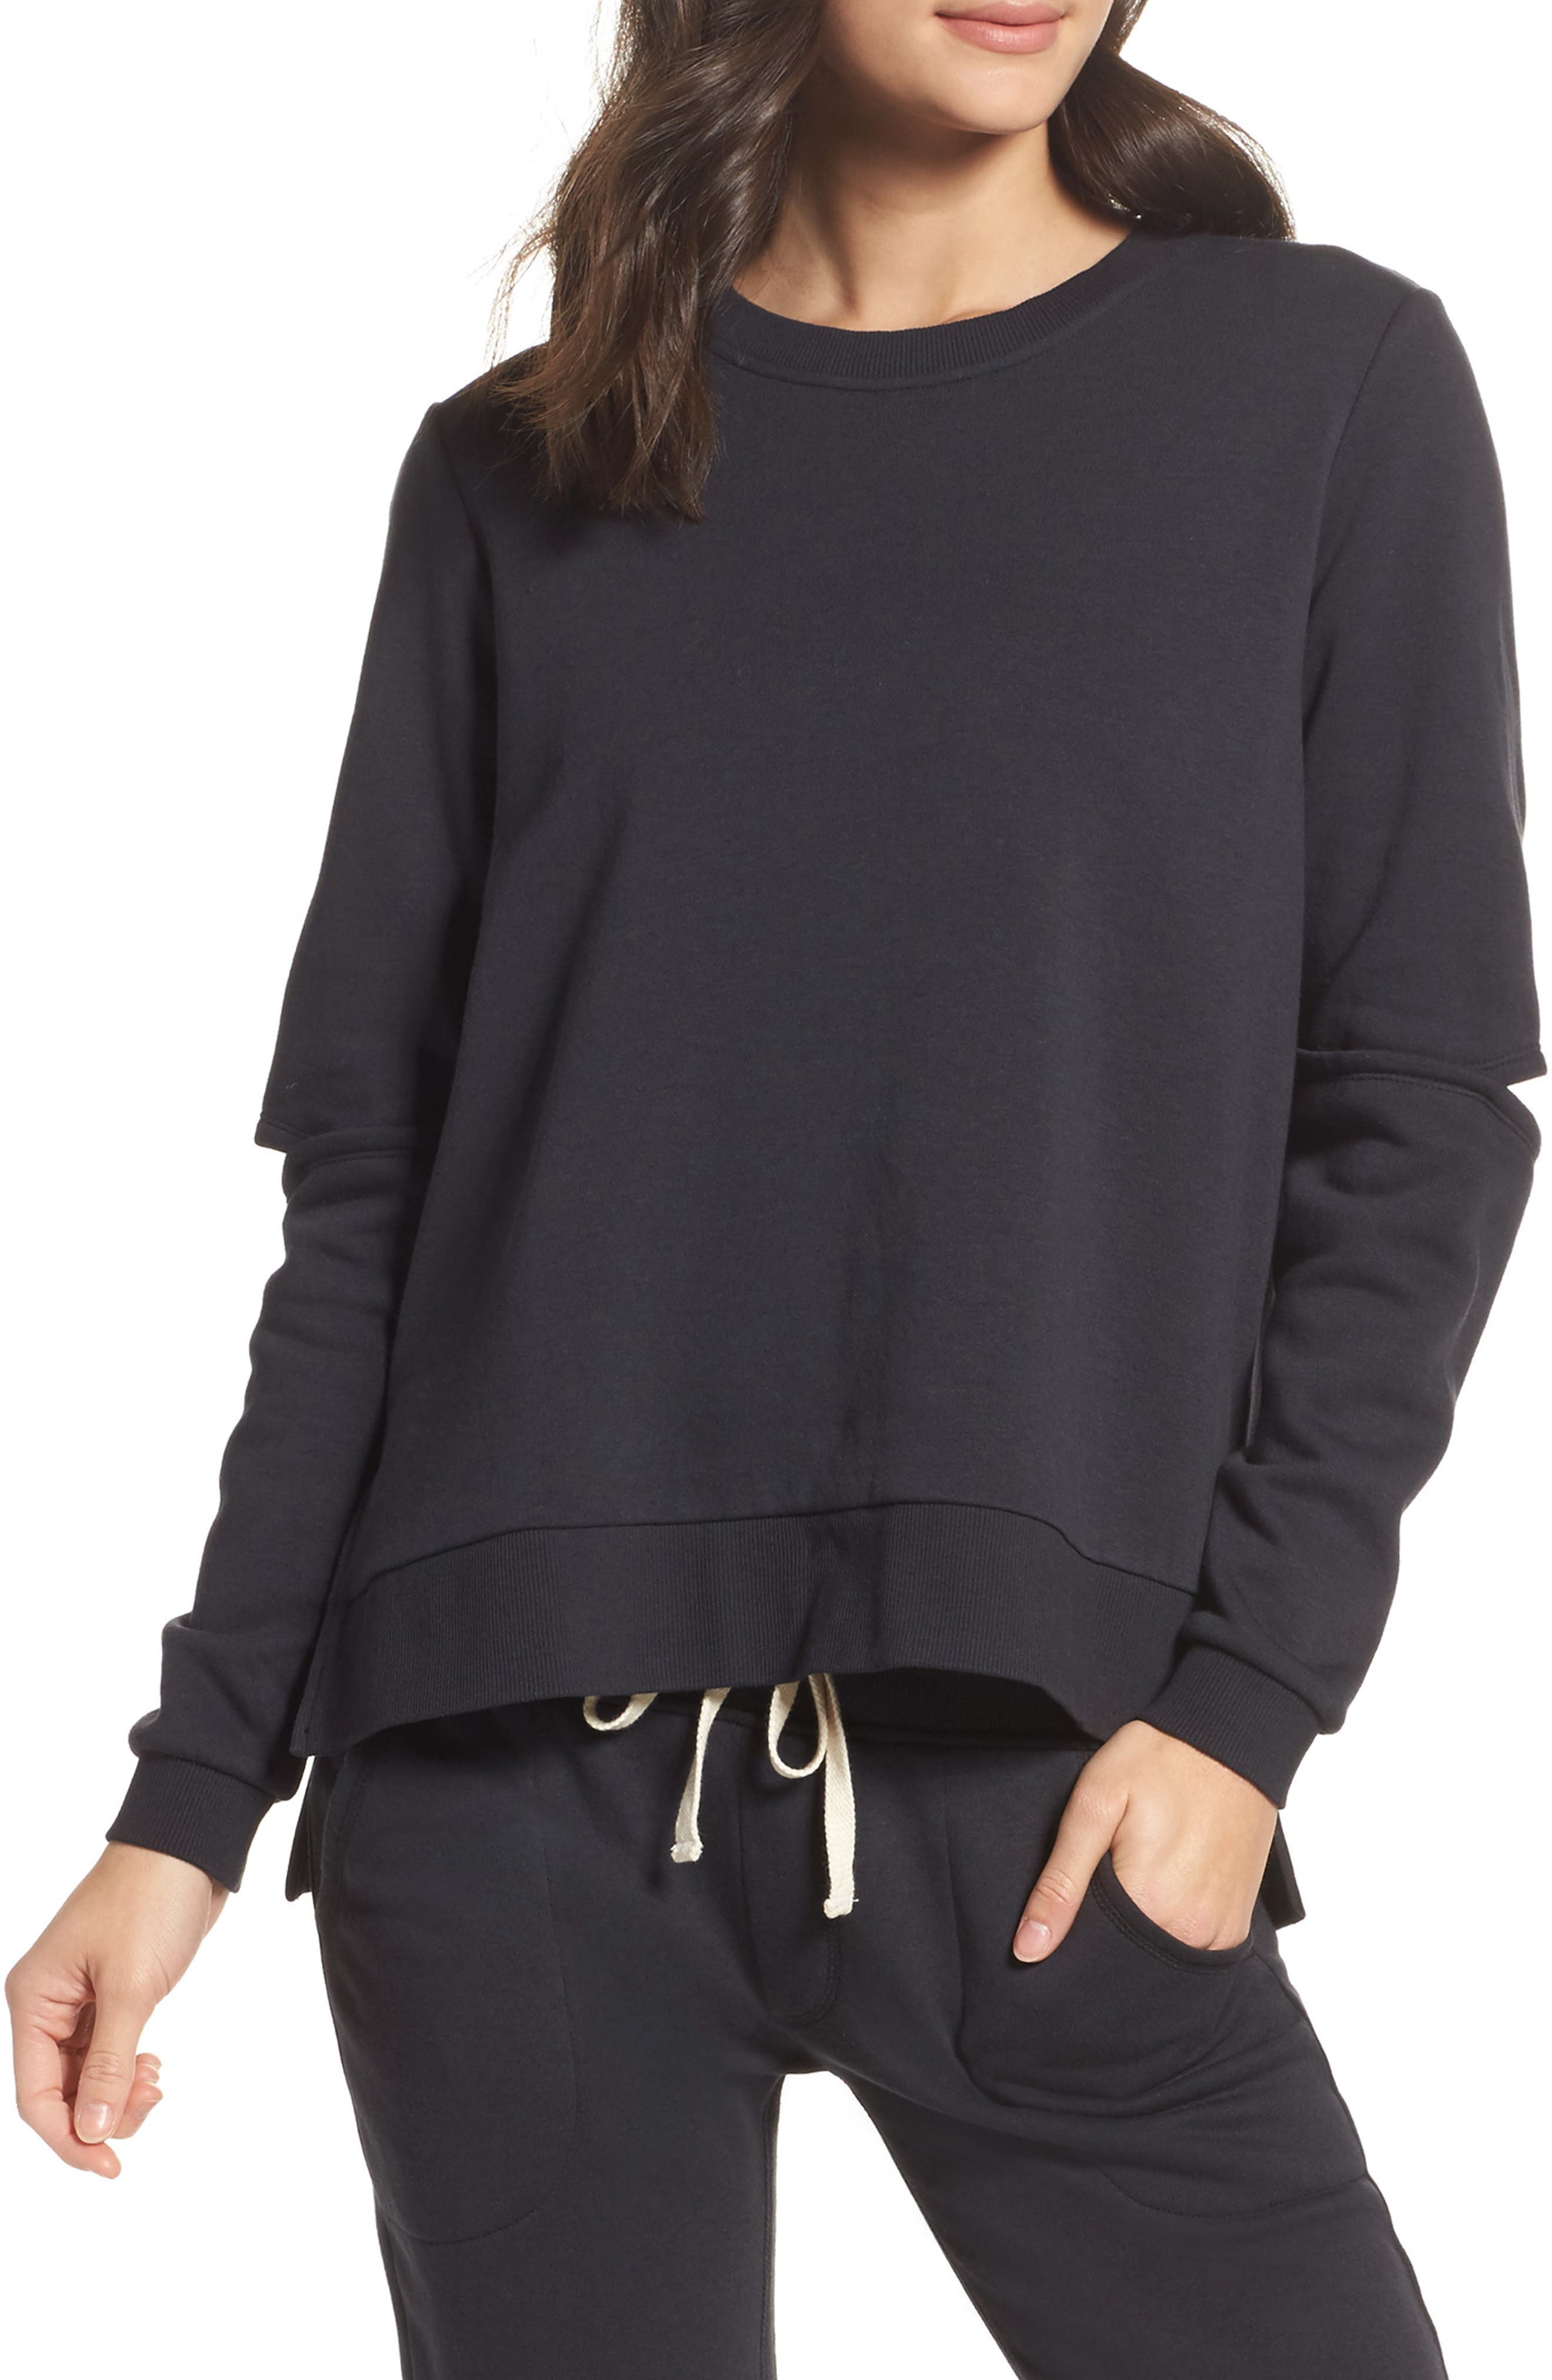 Main Image - Alternative Cutout Sweatshirt